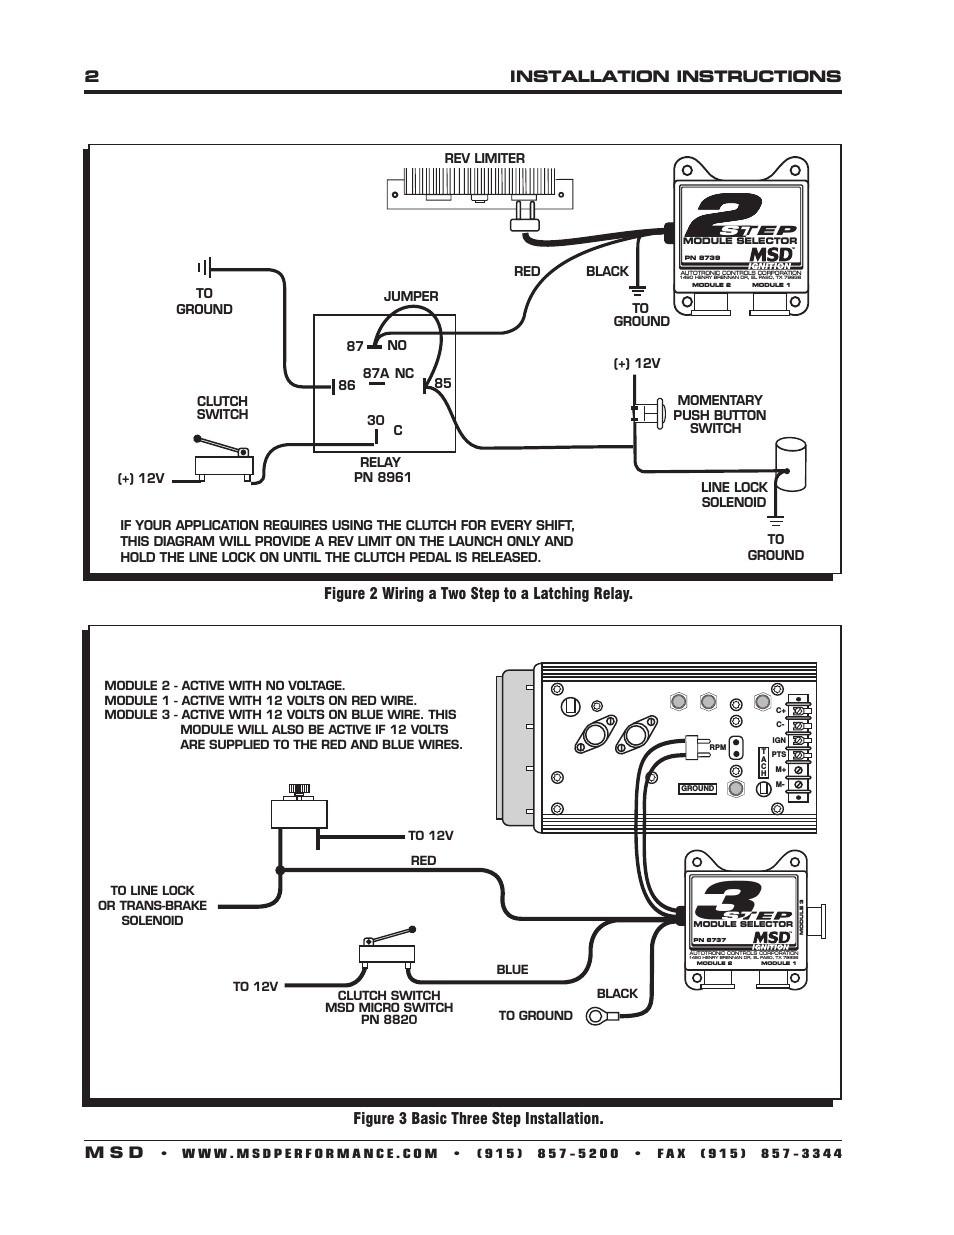 Msd Wiring Diagram Best 2installation Instructions M S D Figure 3